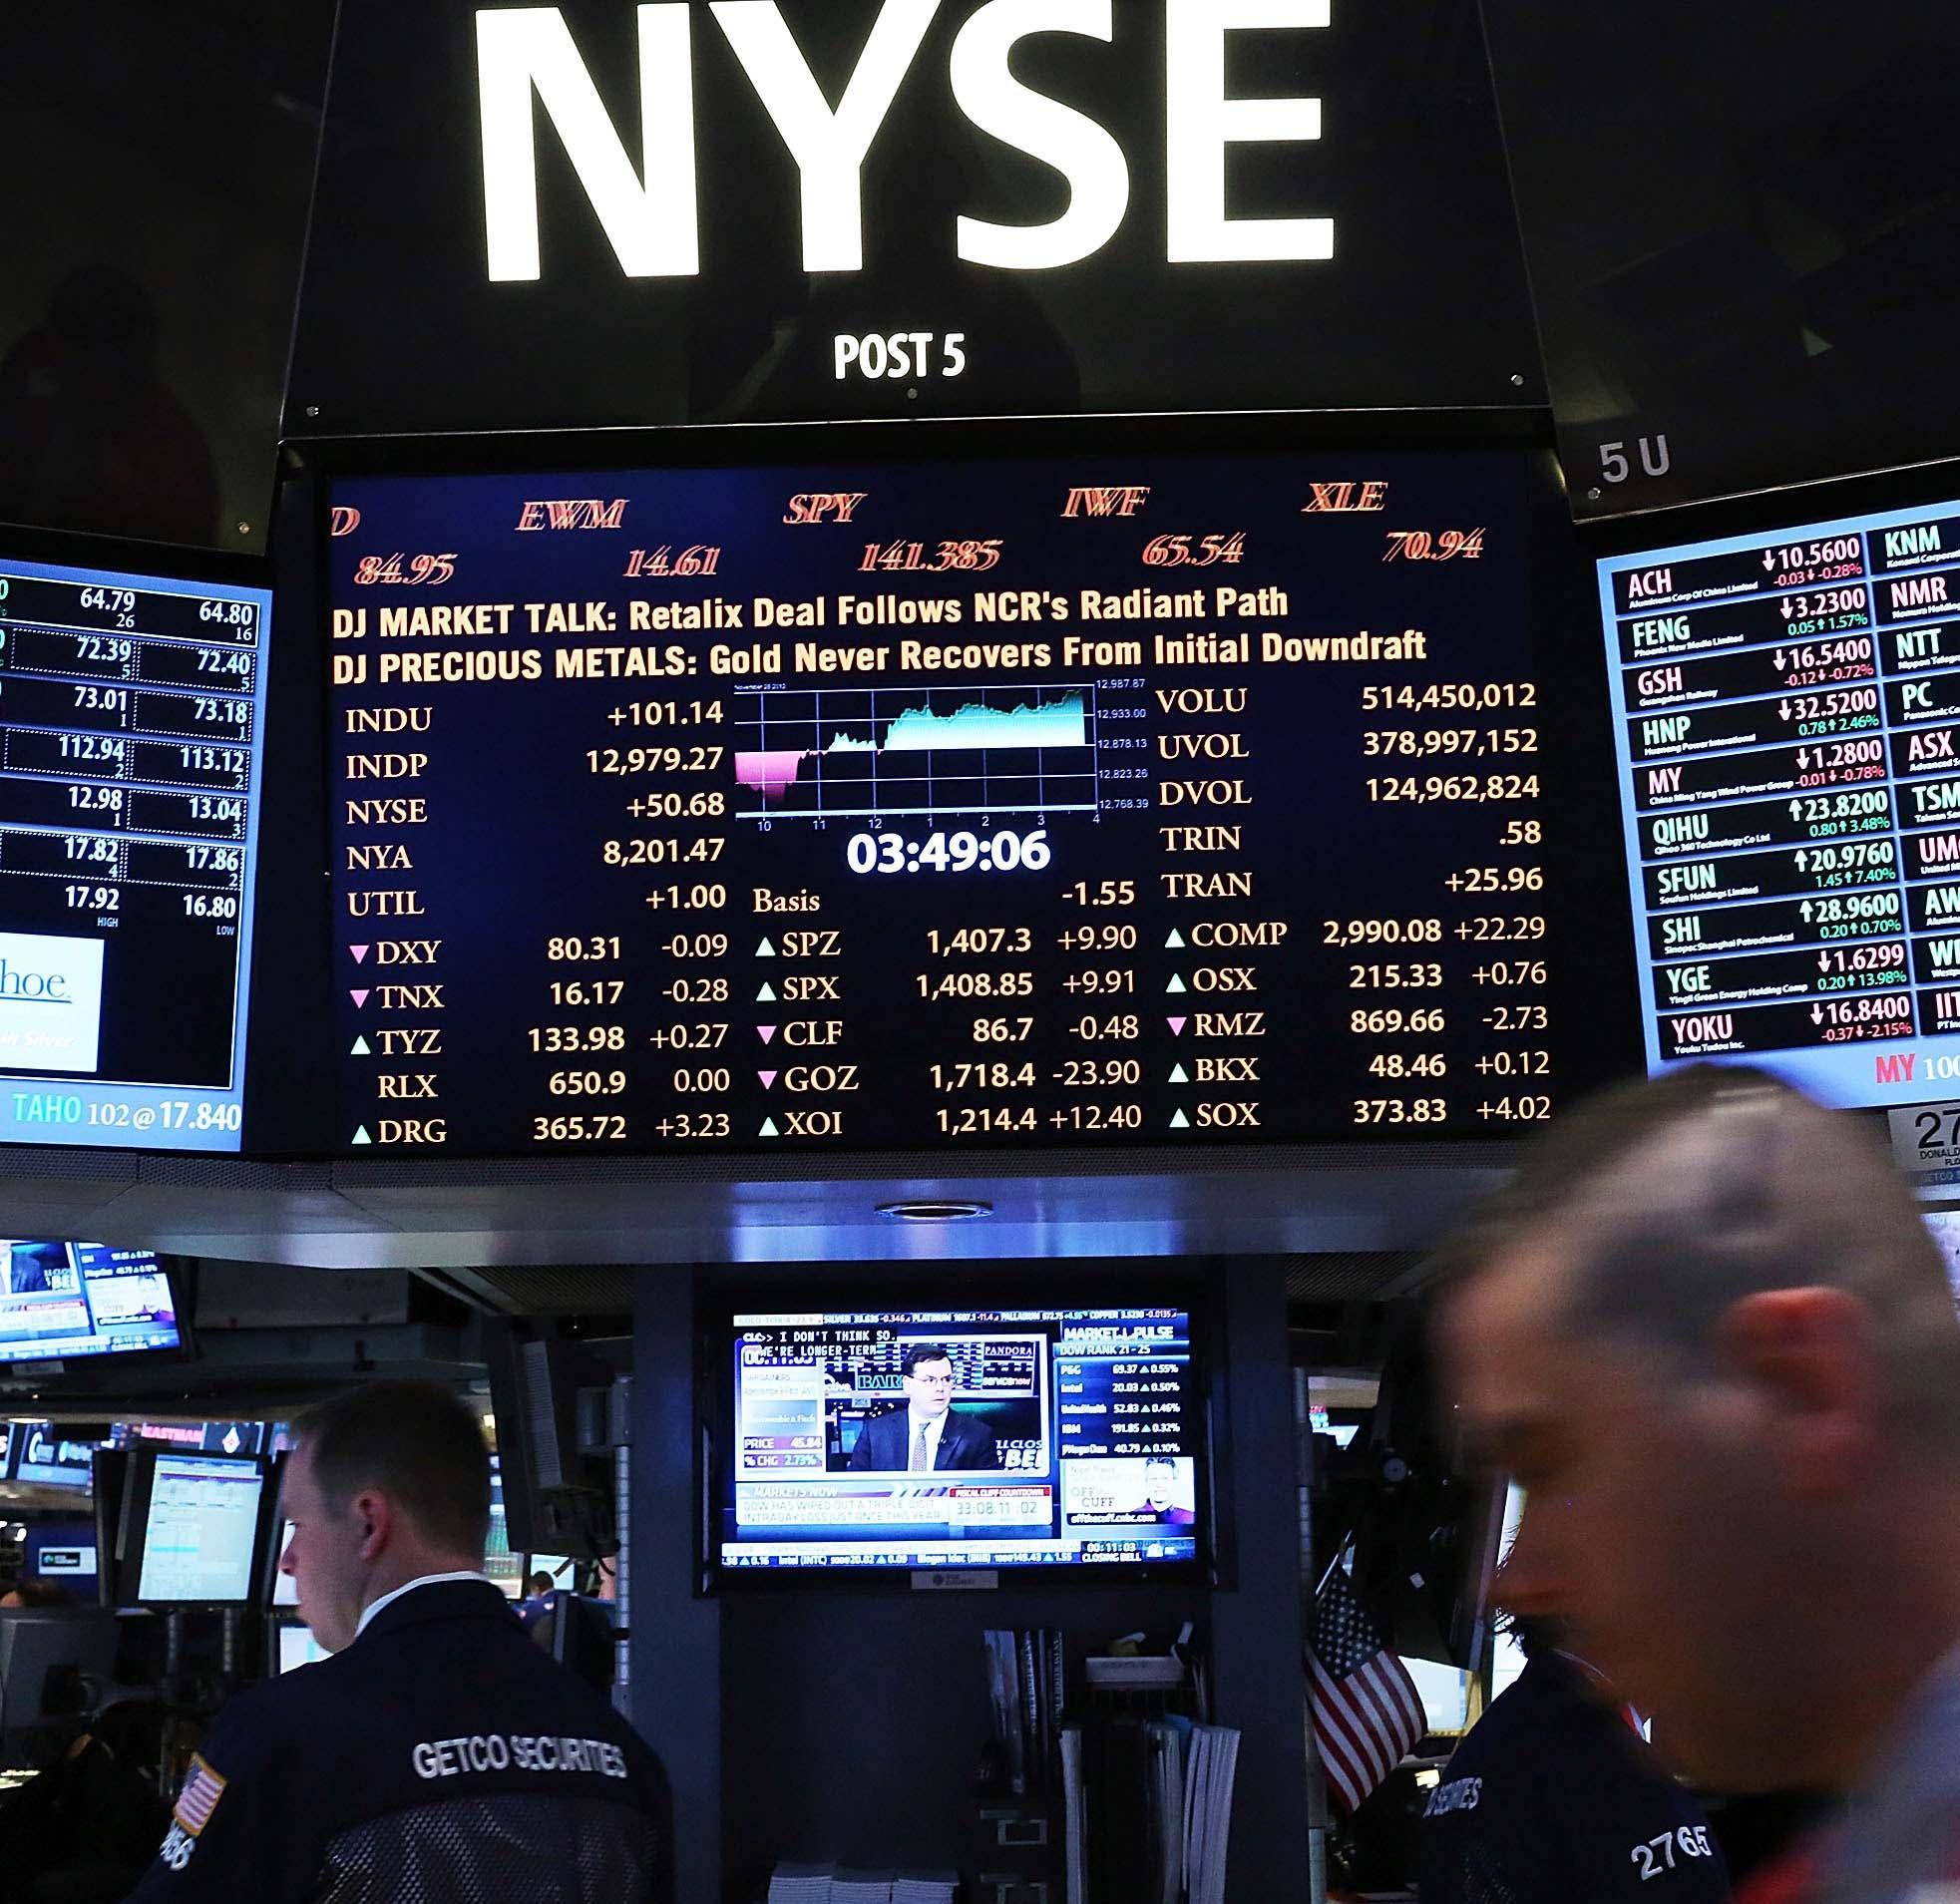 بورس نیویورک (NYSE)